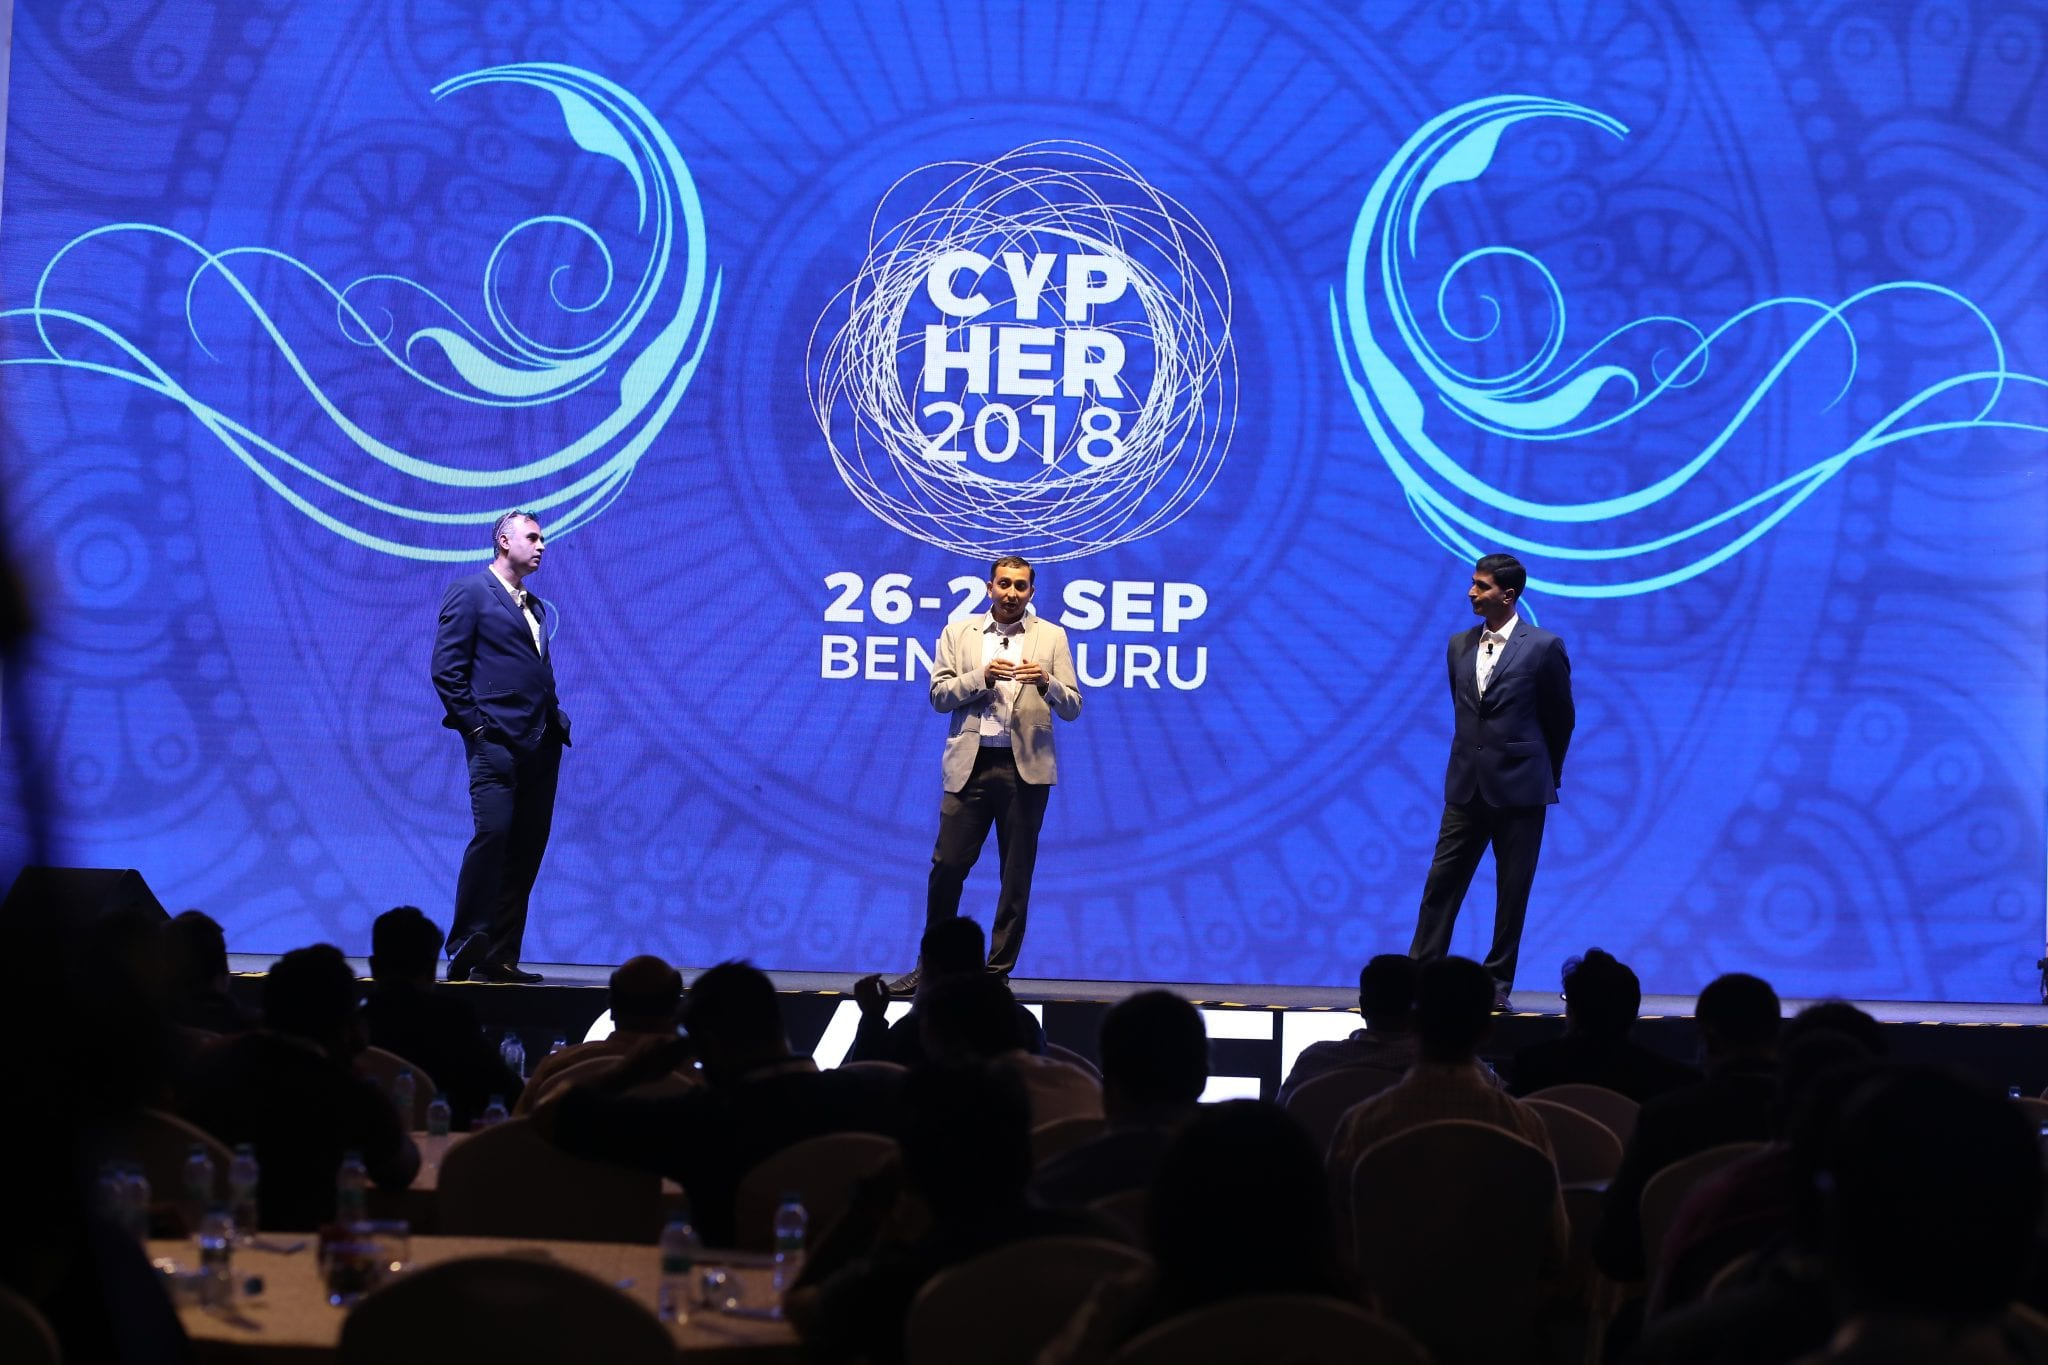 Cypher 2018